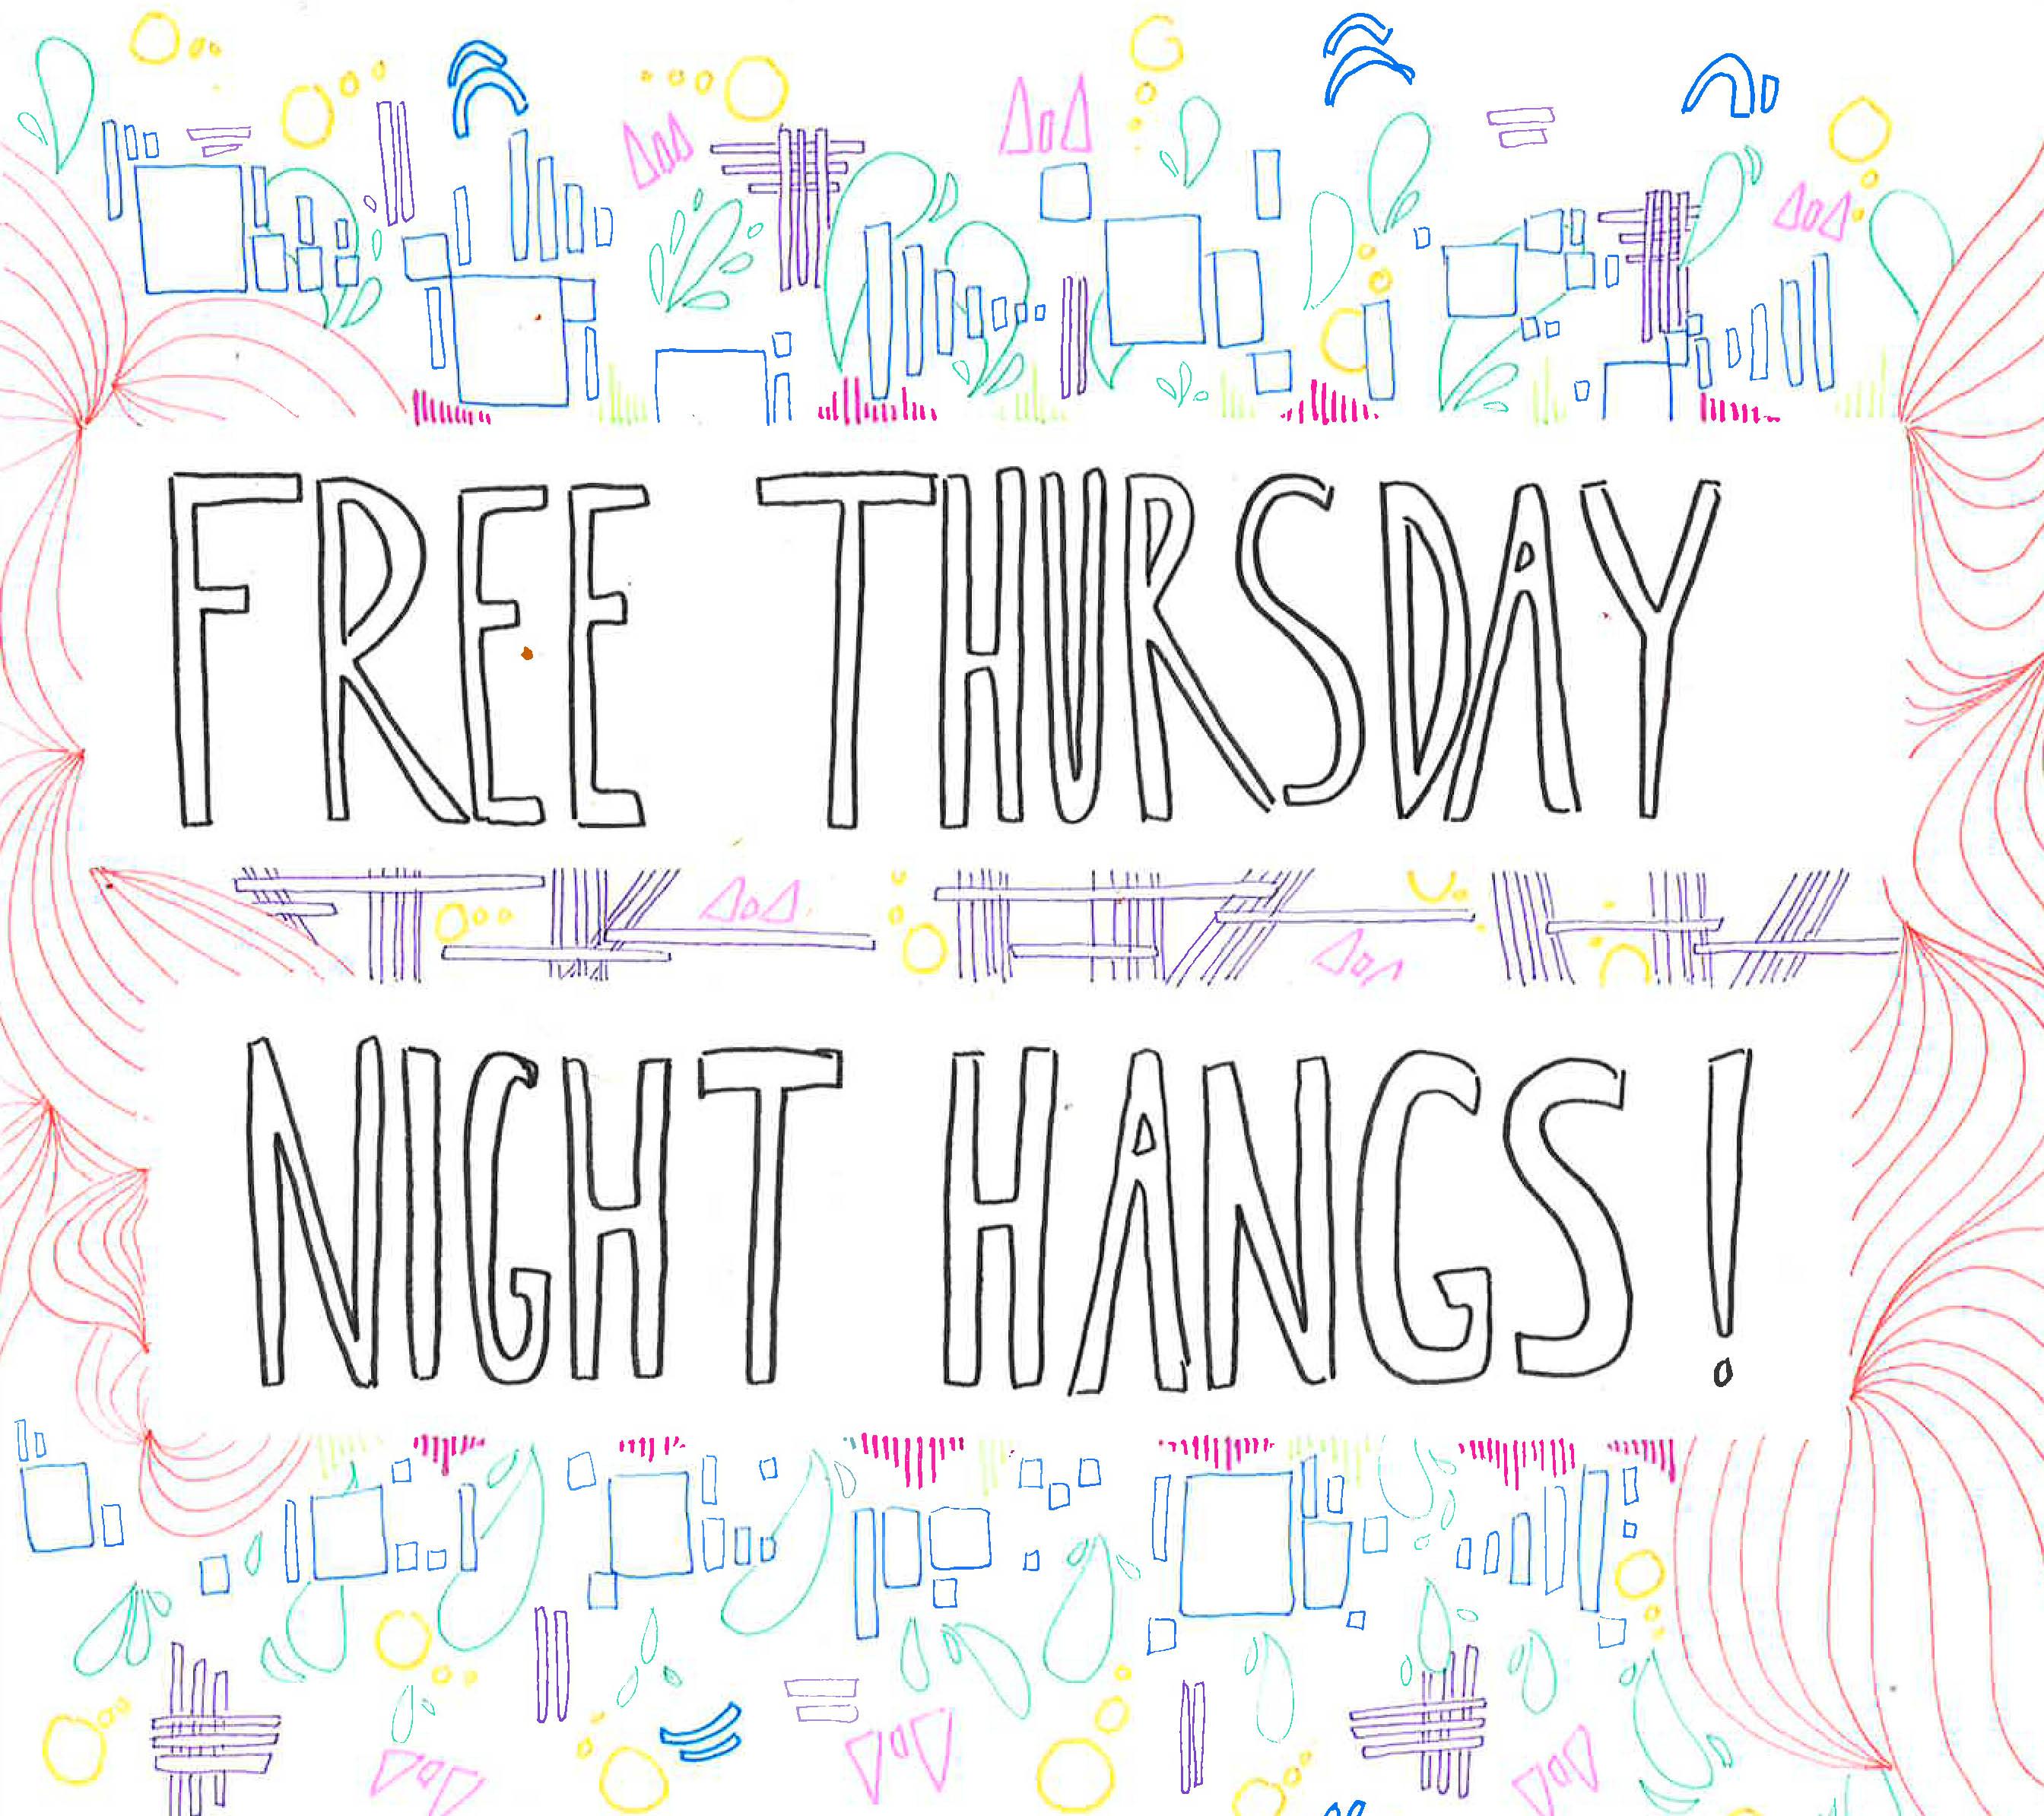 Free Thursday Night Hangs: Bit Bash